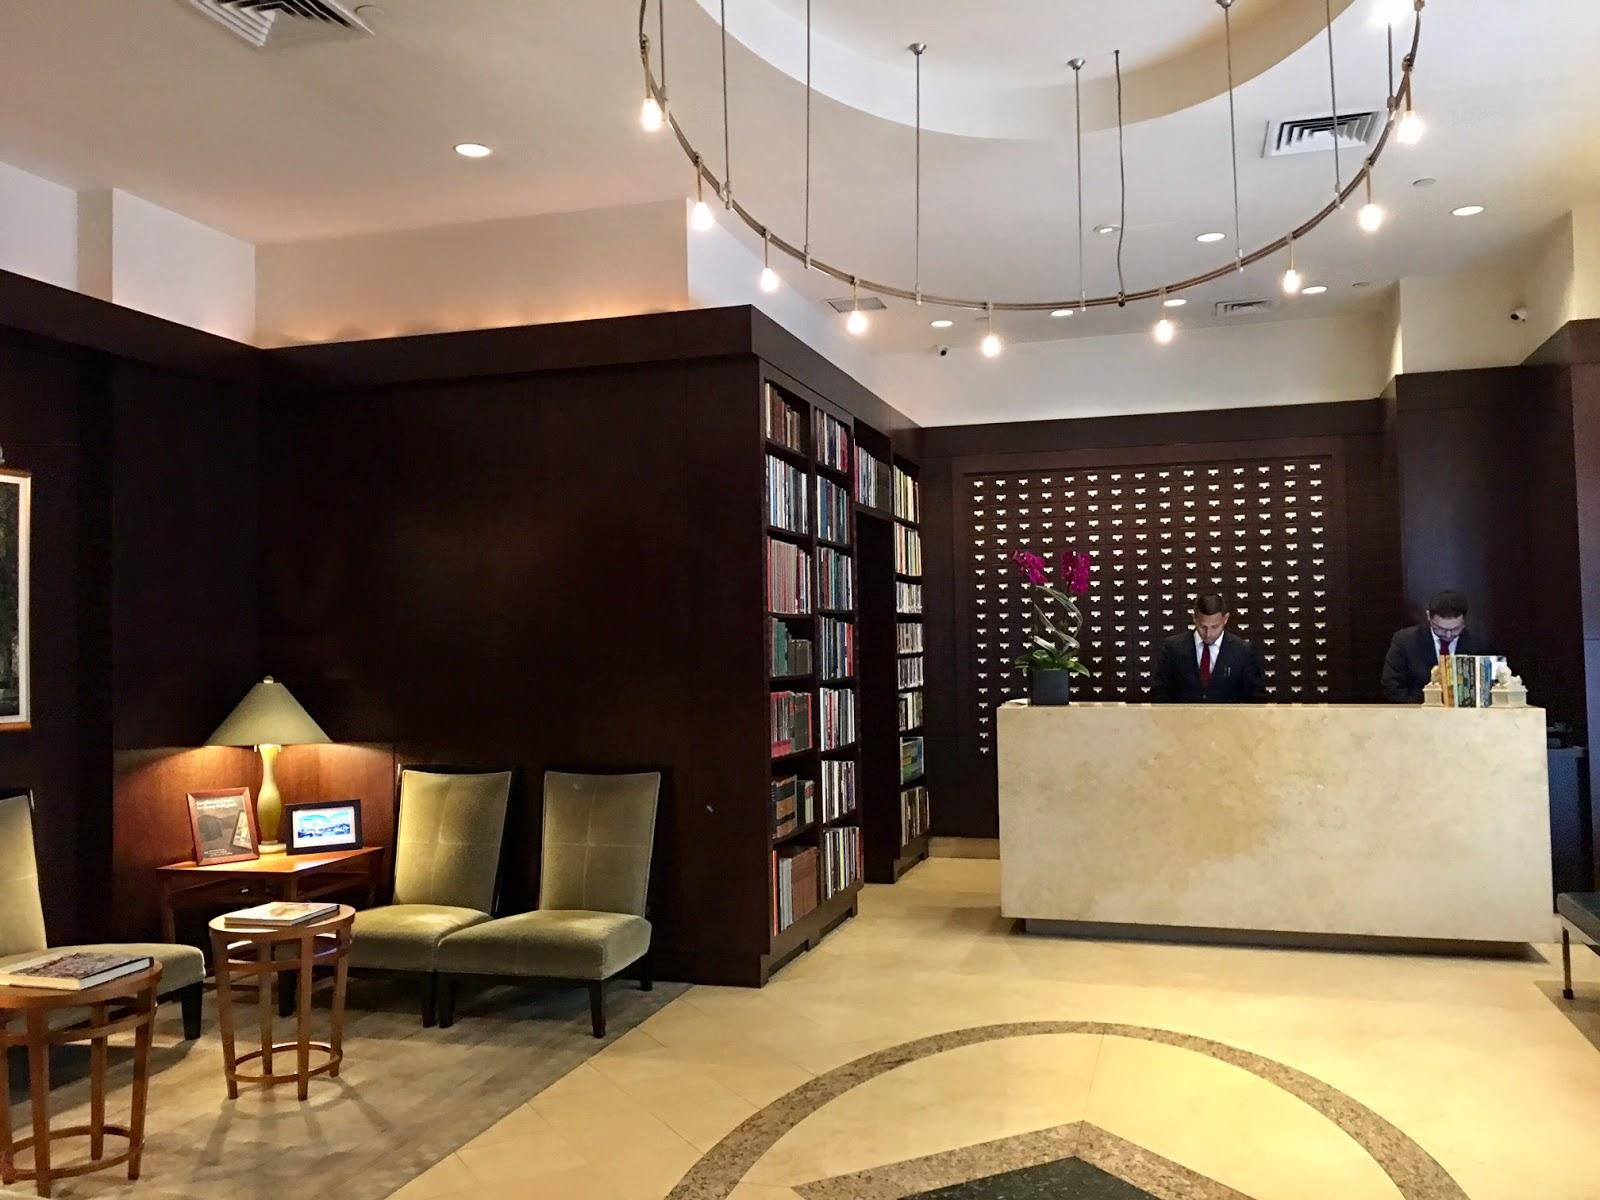 Library Hotel New York Lobby